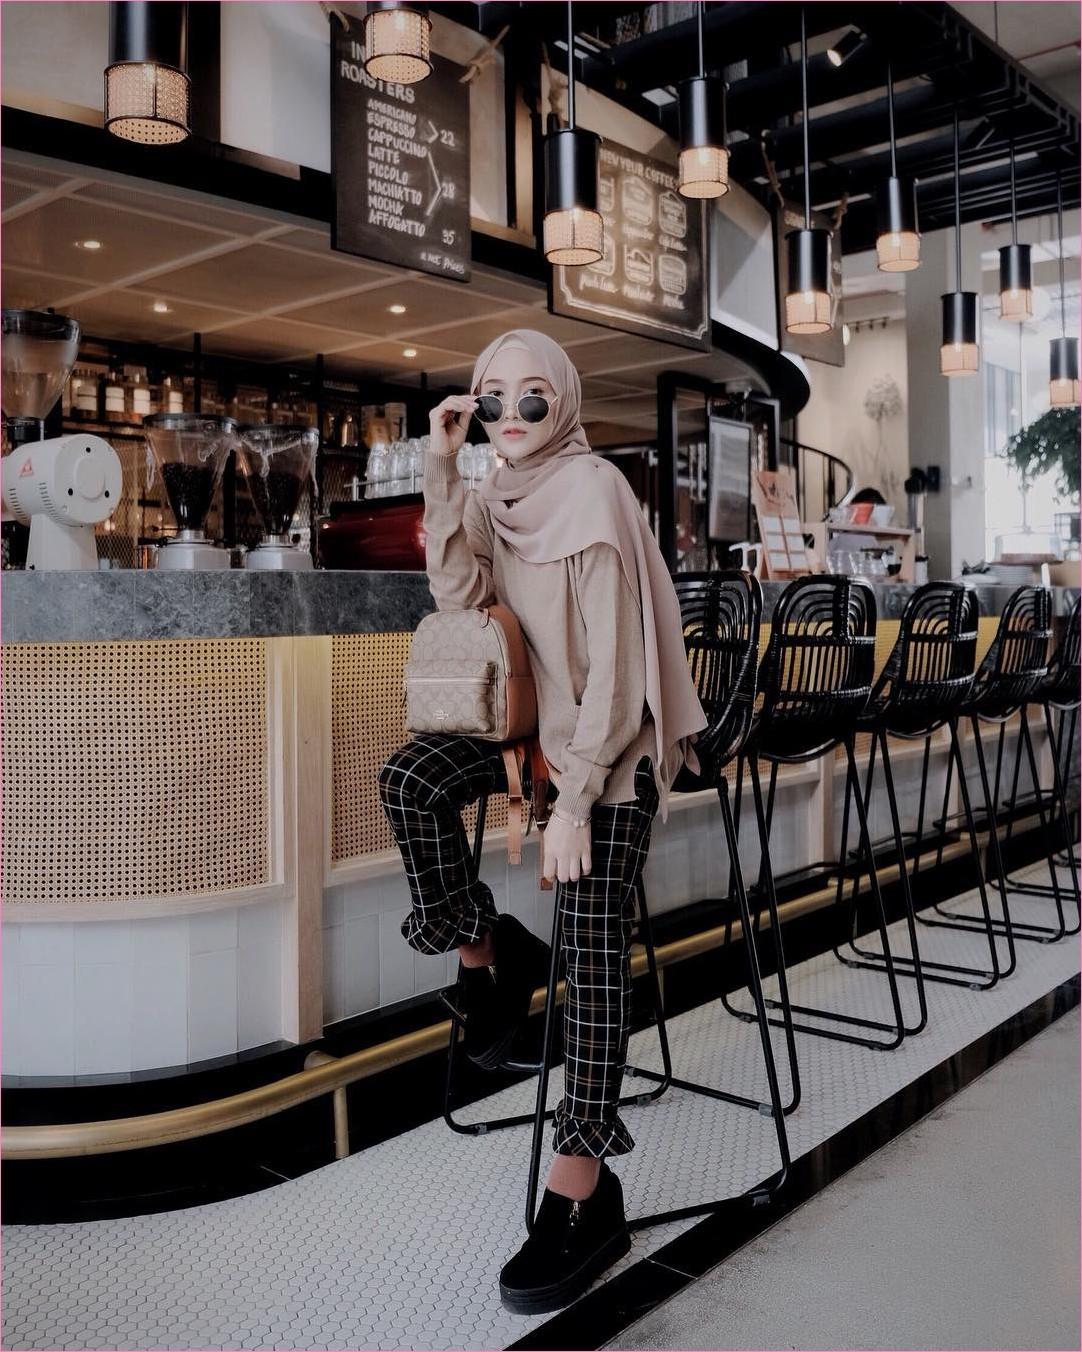 Outfit Kerudung Pashmina Ala Selebgram 2018 hijab pashmina diamond kemeja baju blouse krem celana bahan kotak-kotak kets sneakers ;loafers and slip ons hitam kacamata bulat ciput rajut backpack coklat tua ootd trendy kekinian